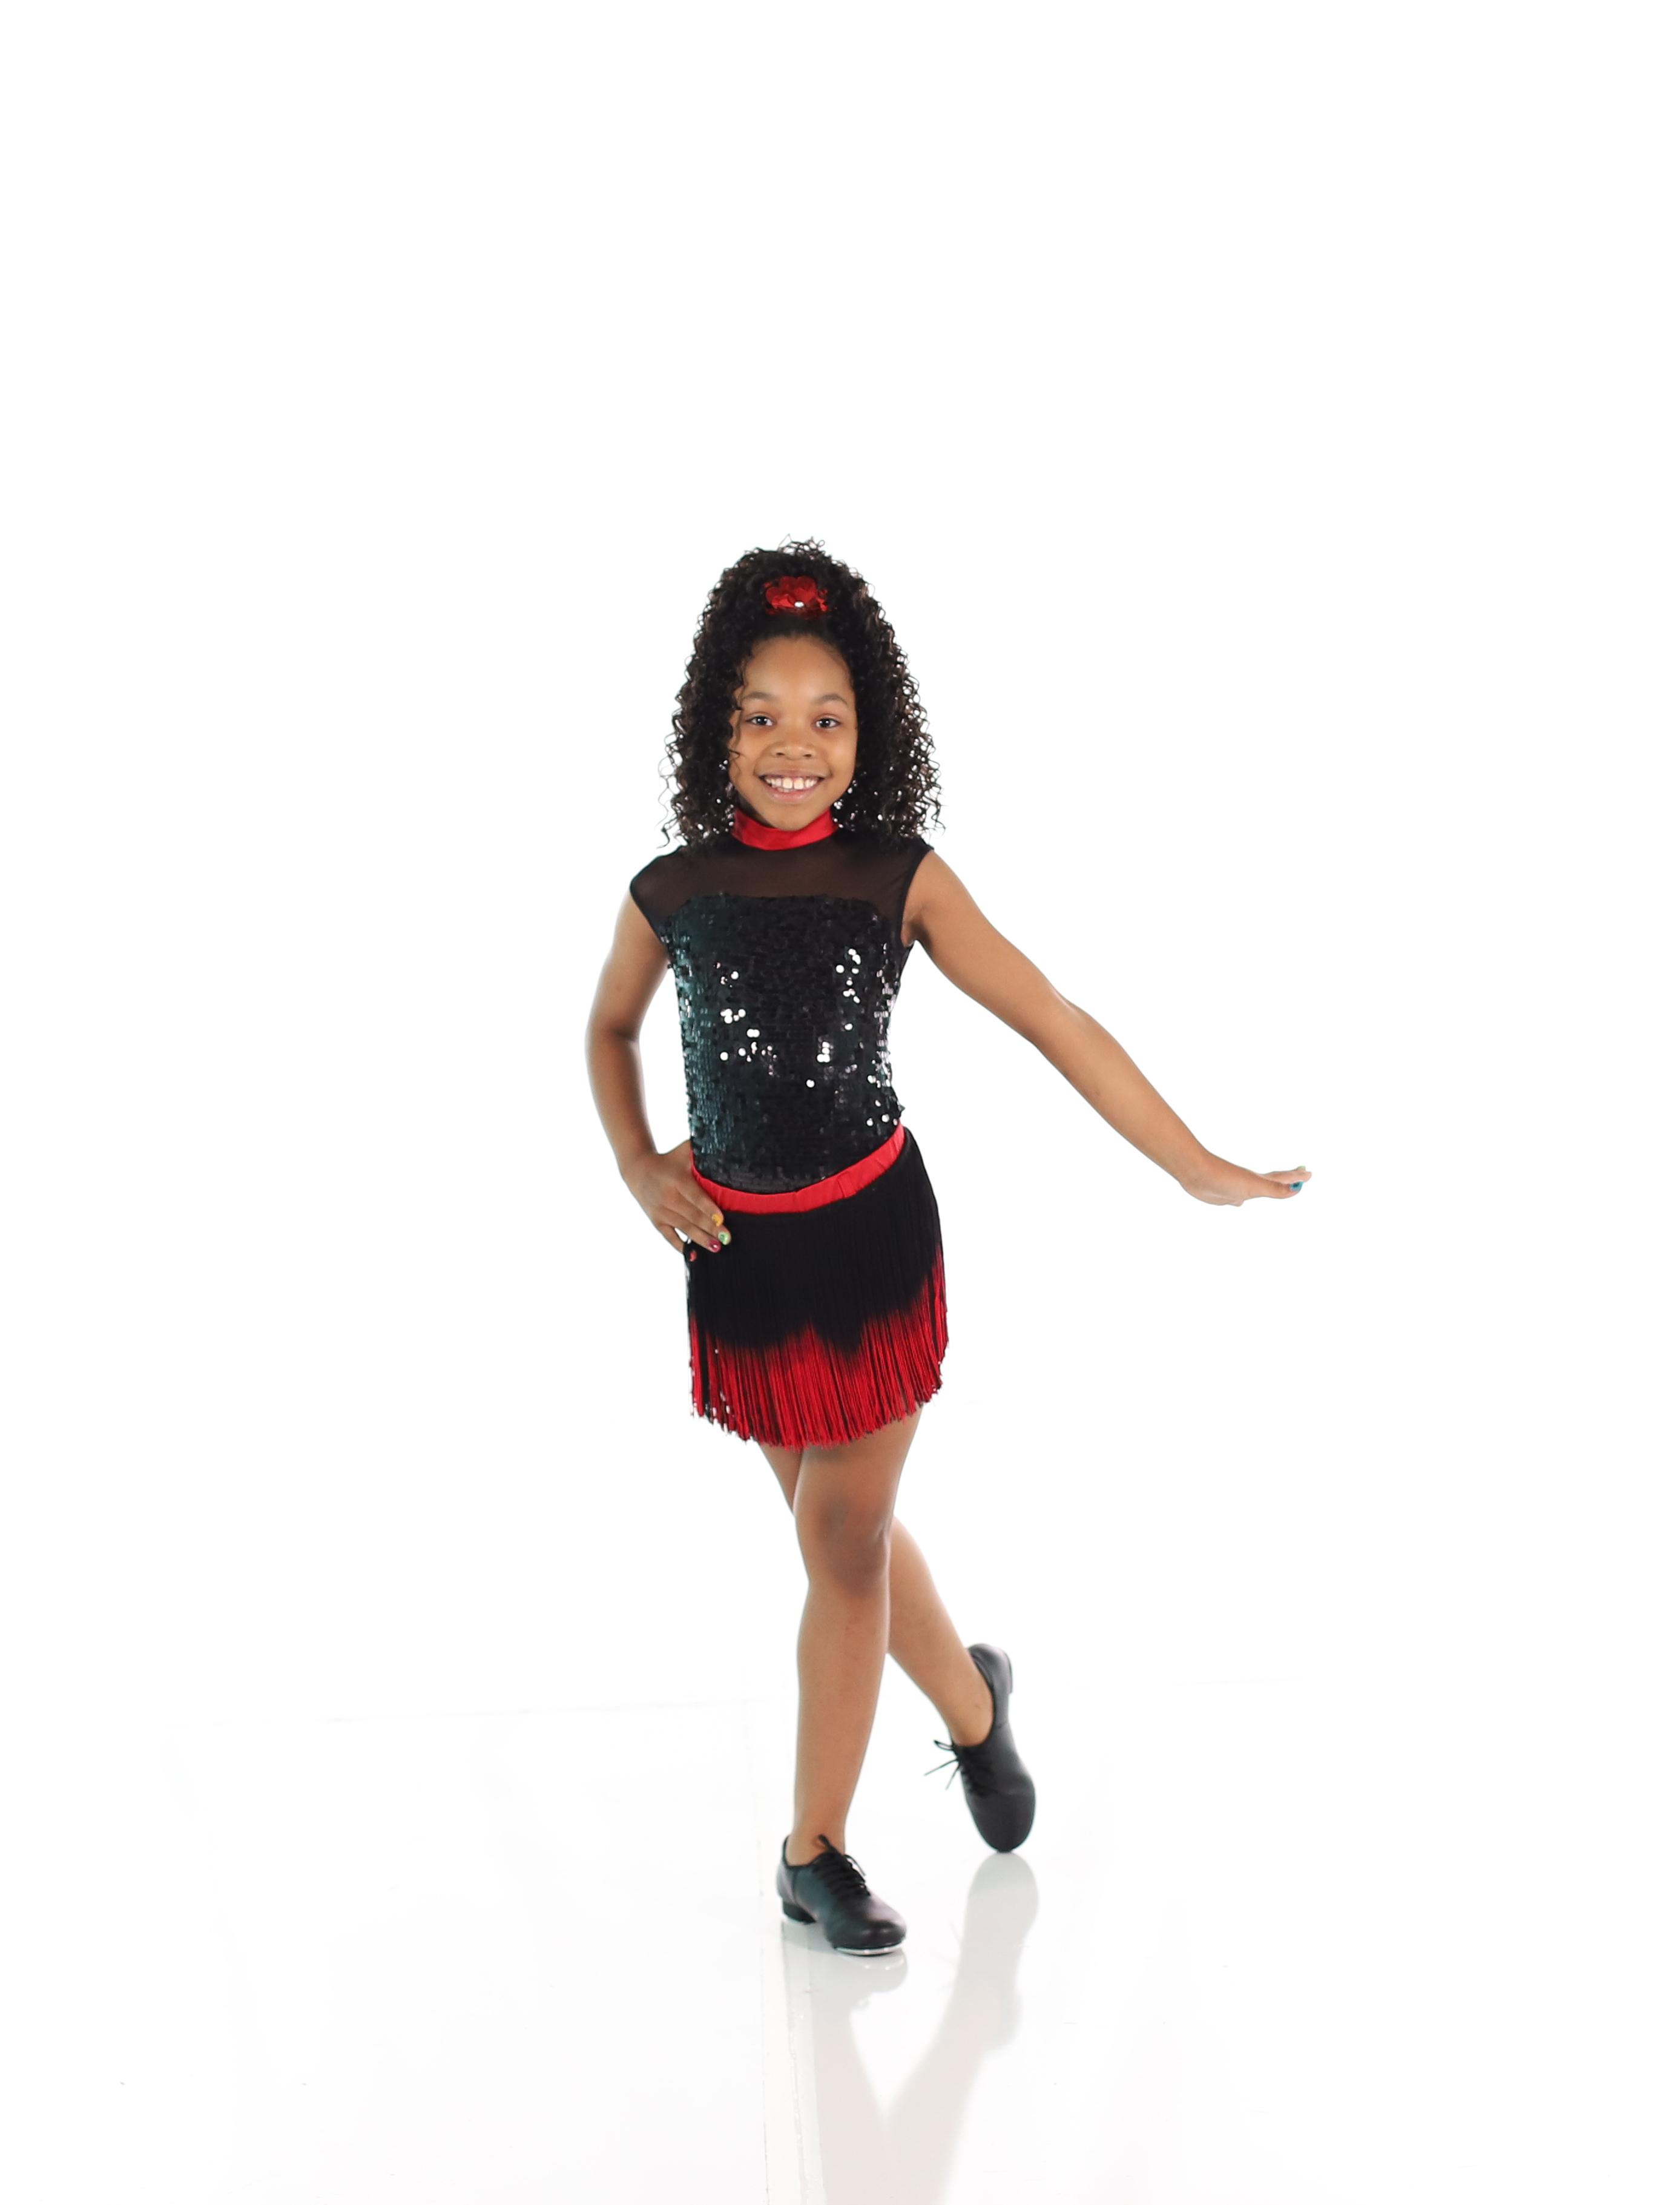 elementary tap dance classes